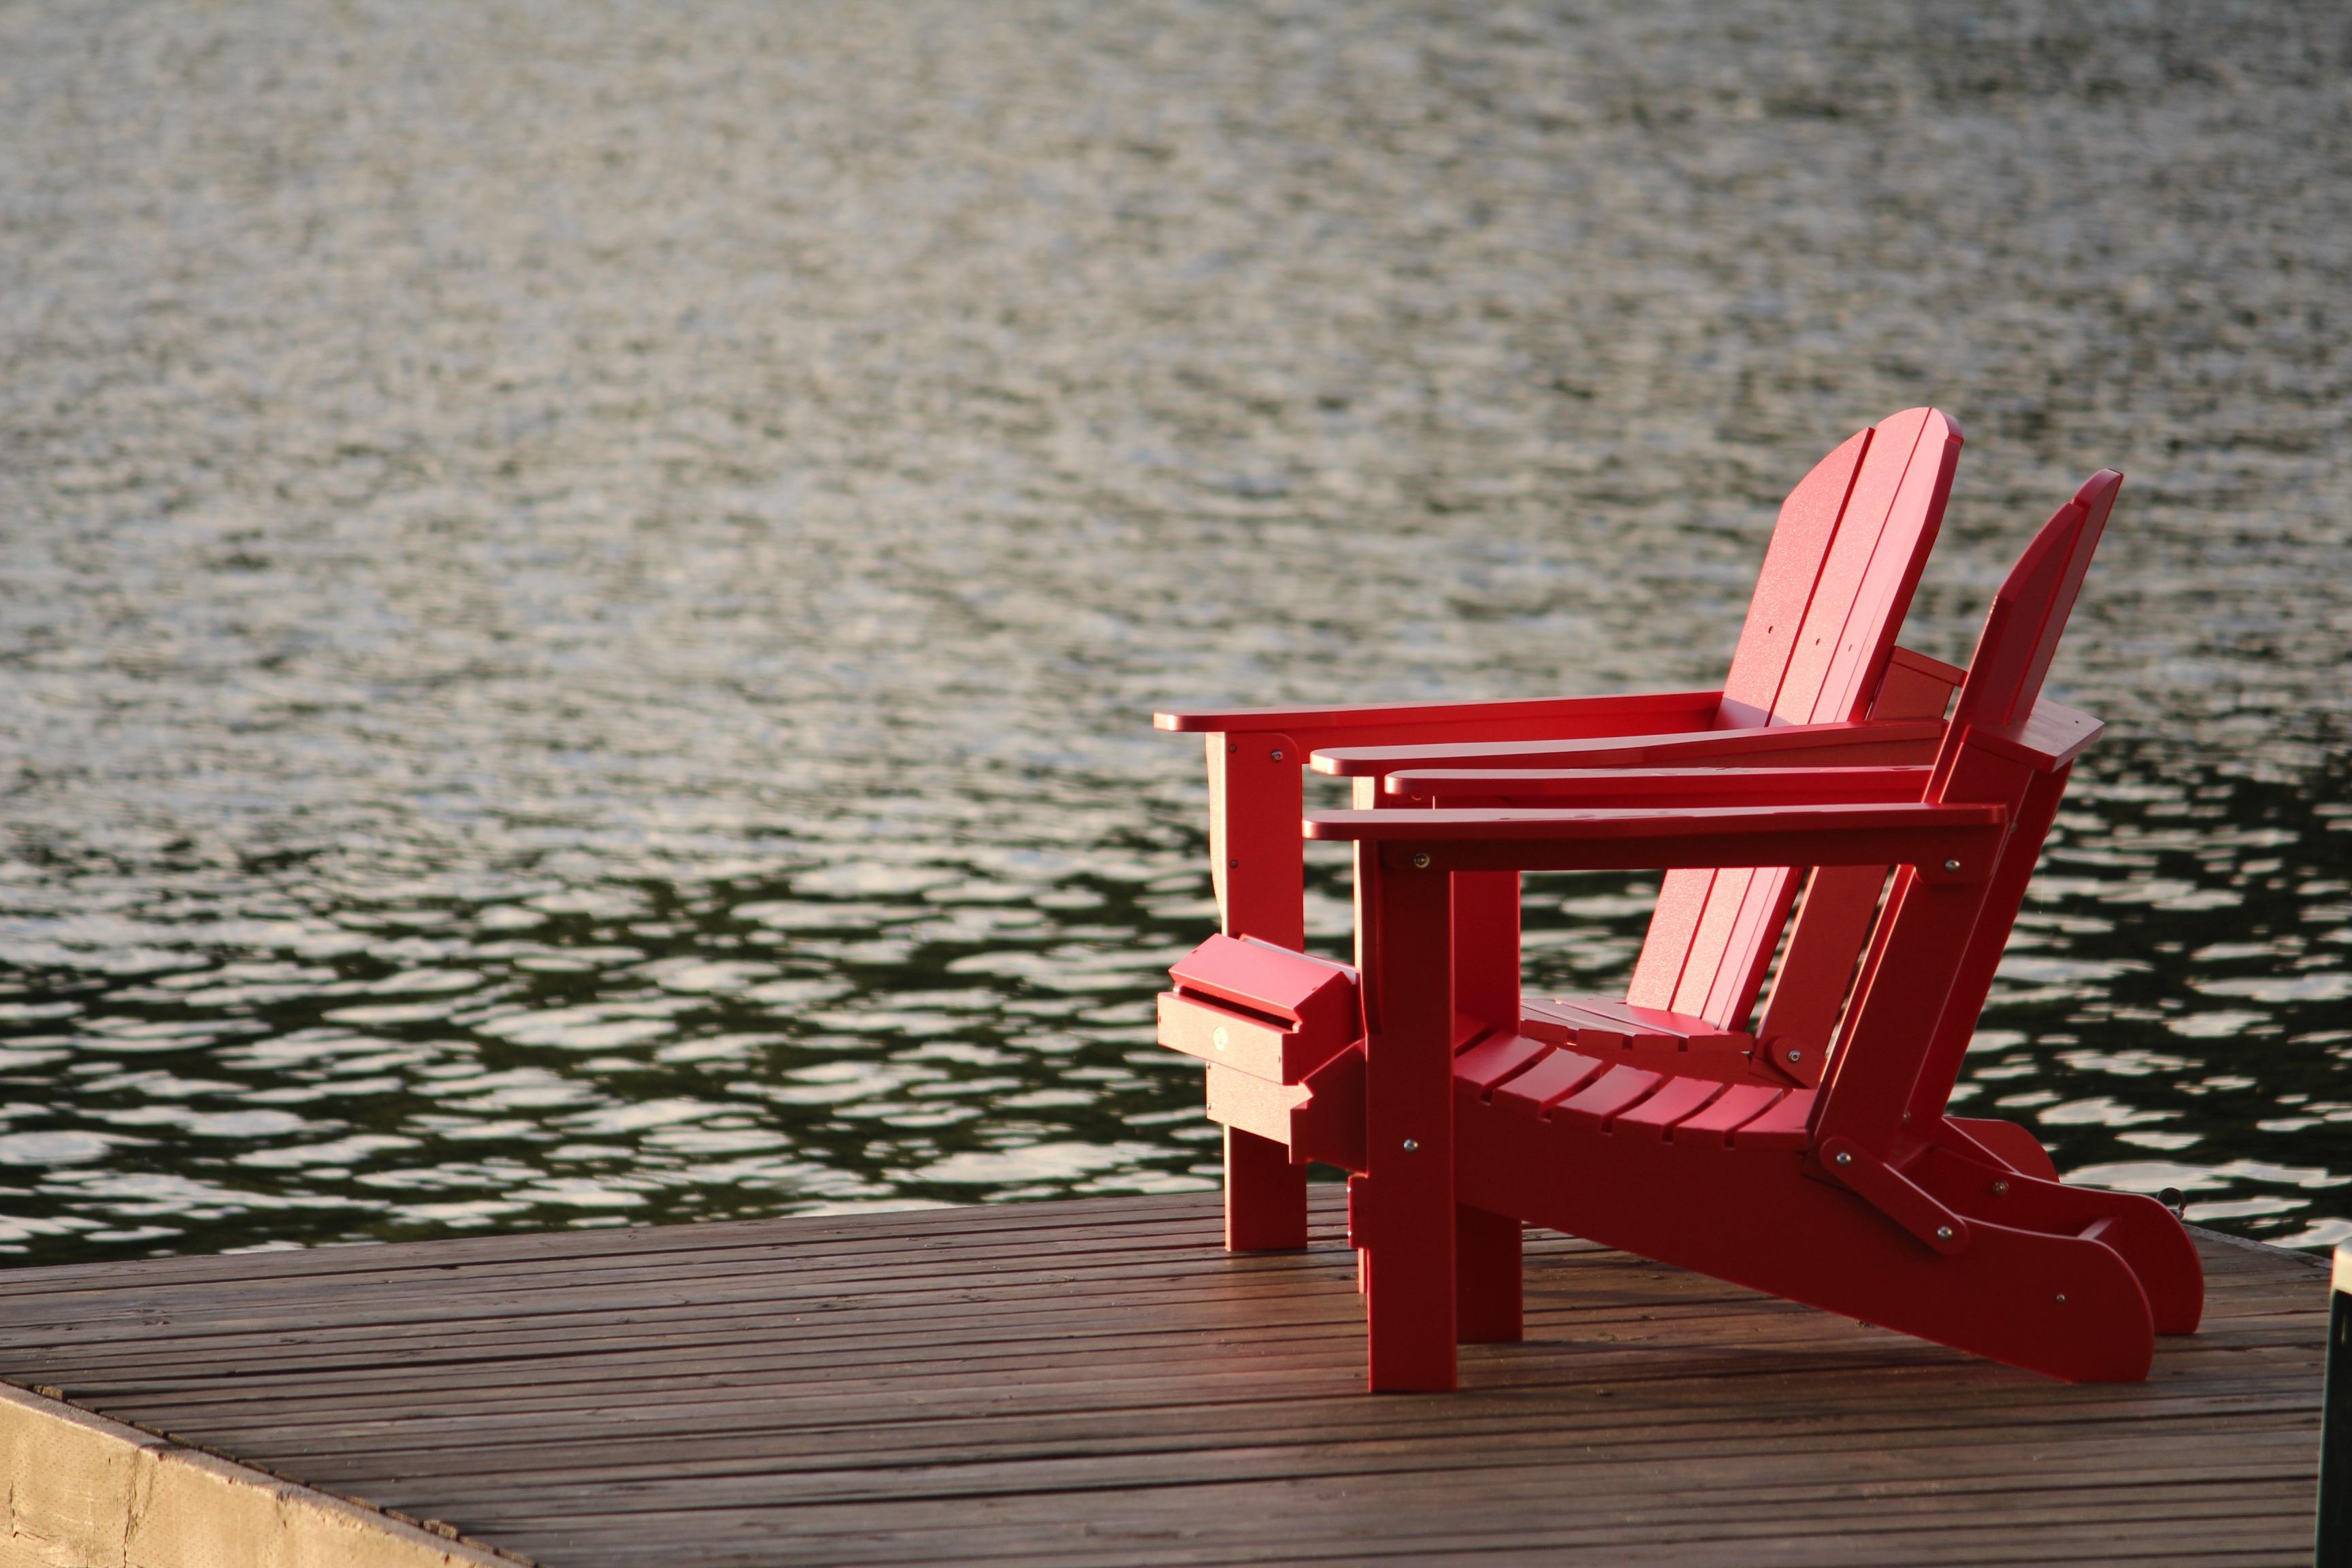 Fotos gratis : agua, naturaleza, al aire libre, muelle, madera ...